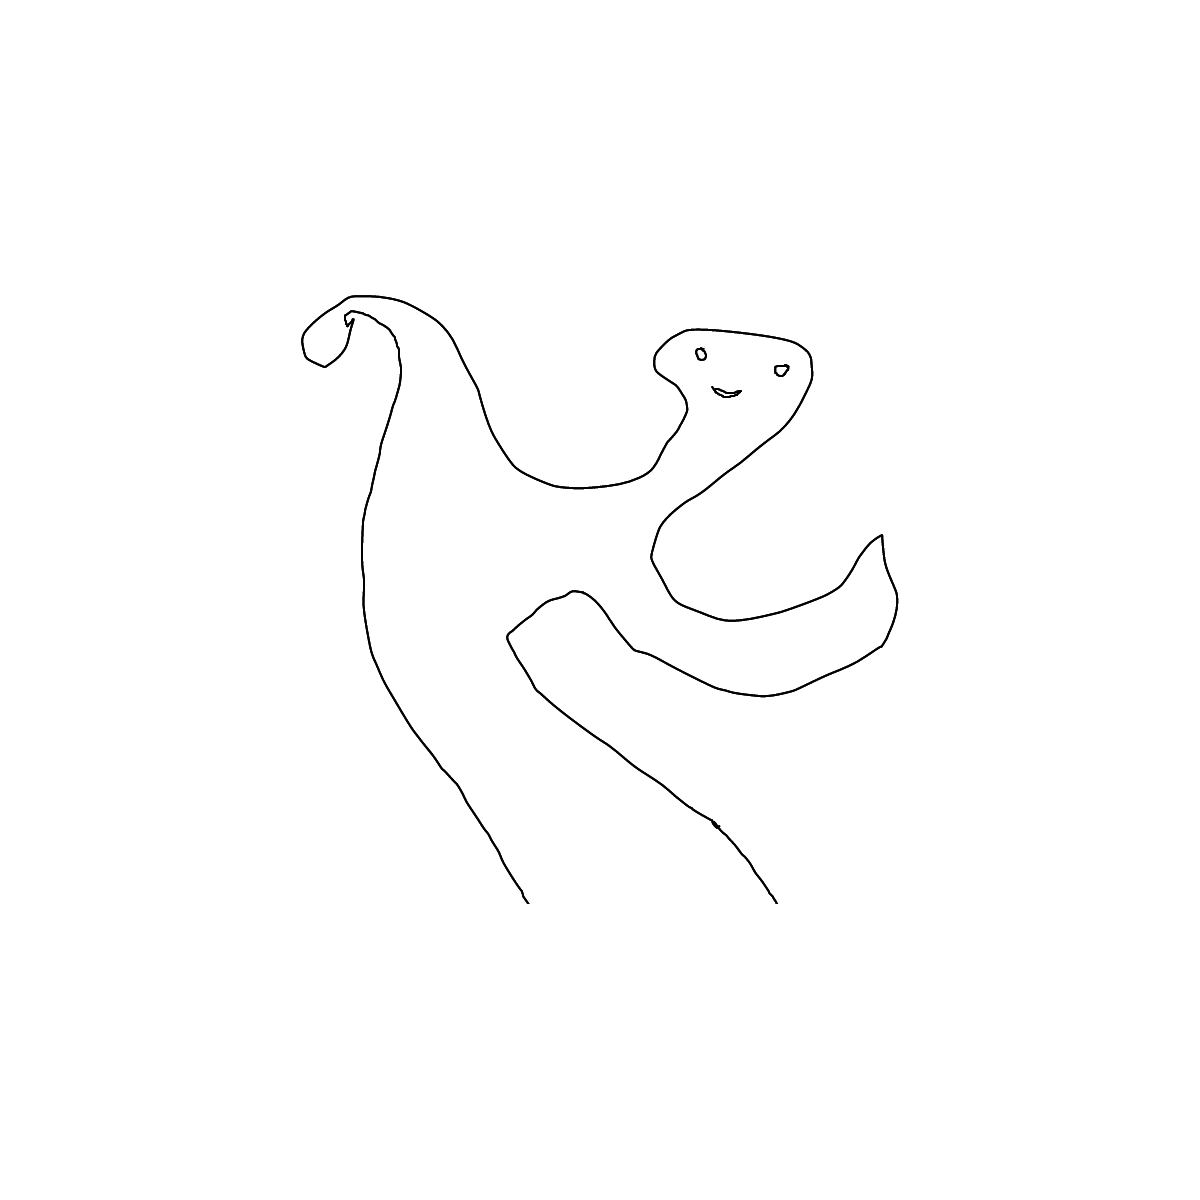 BAAAM drawing#9876 lat:35.7811470031738300lng: -78.6393203735351600